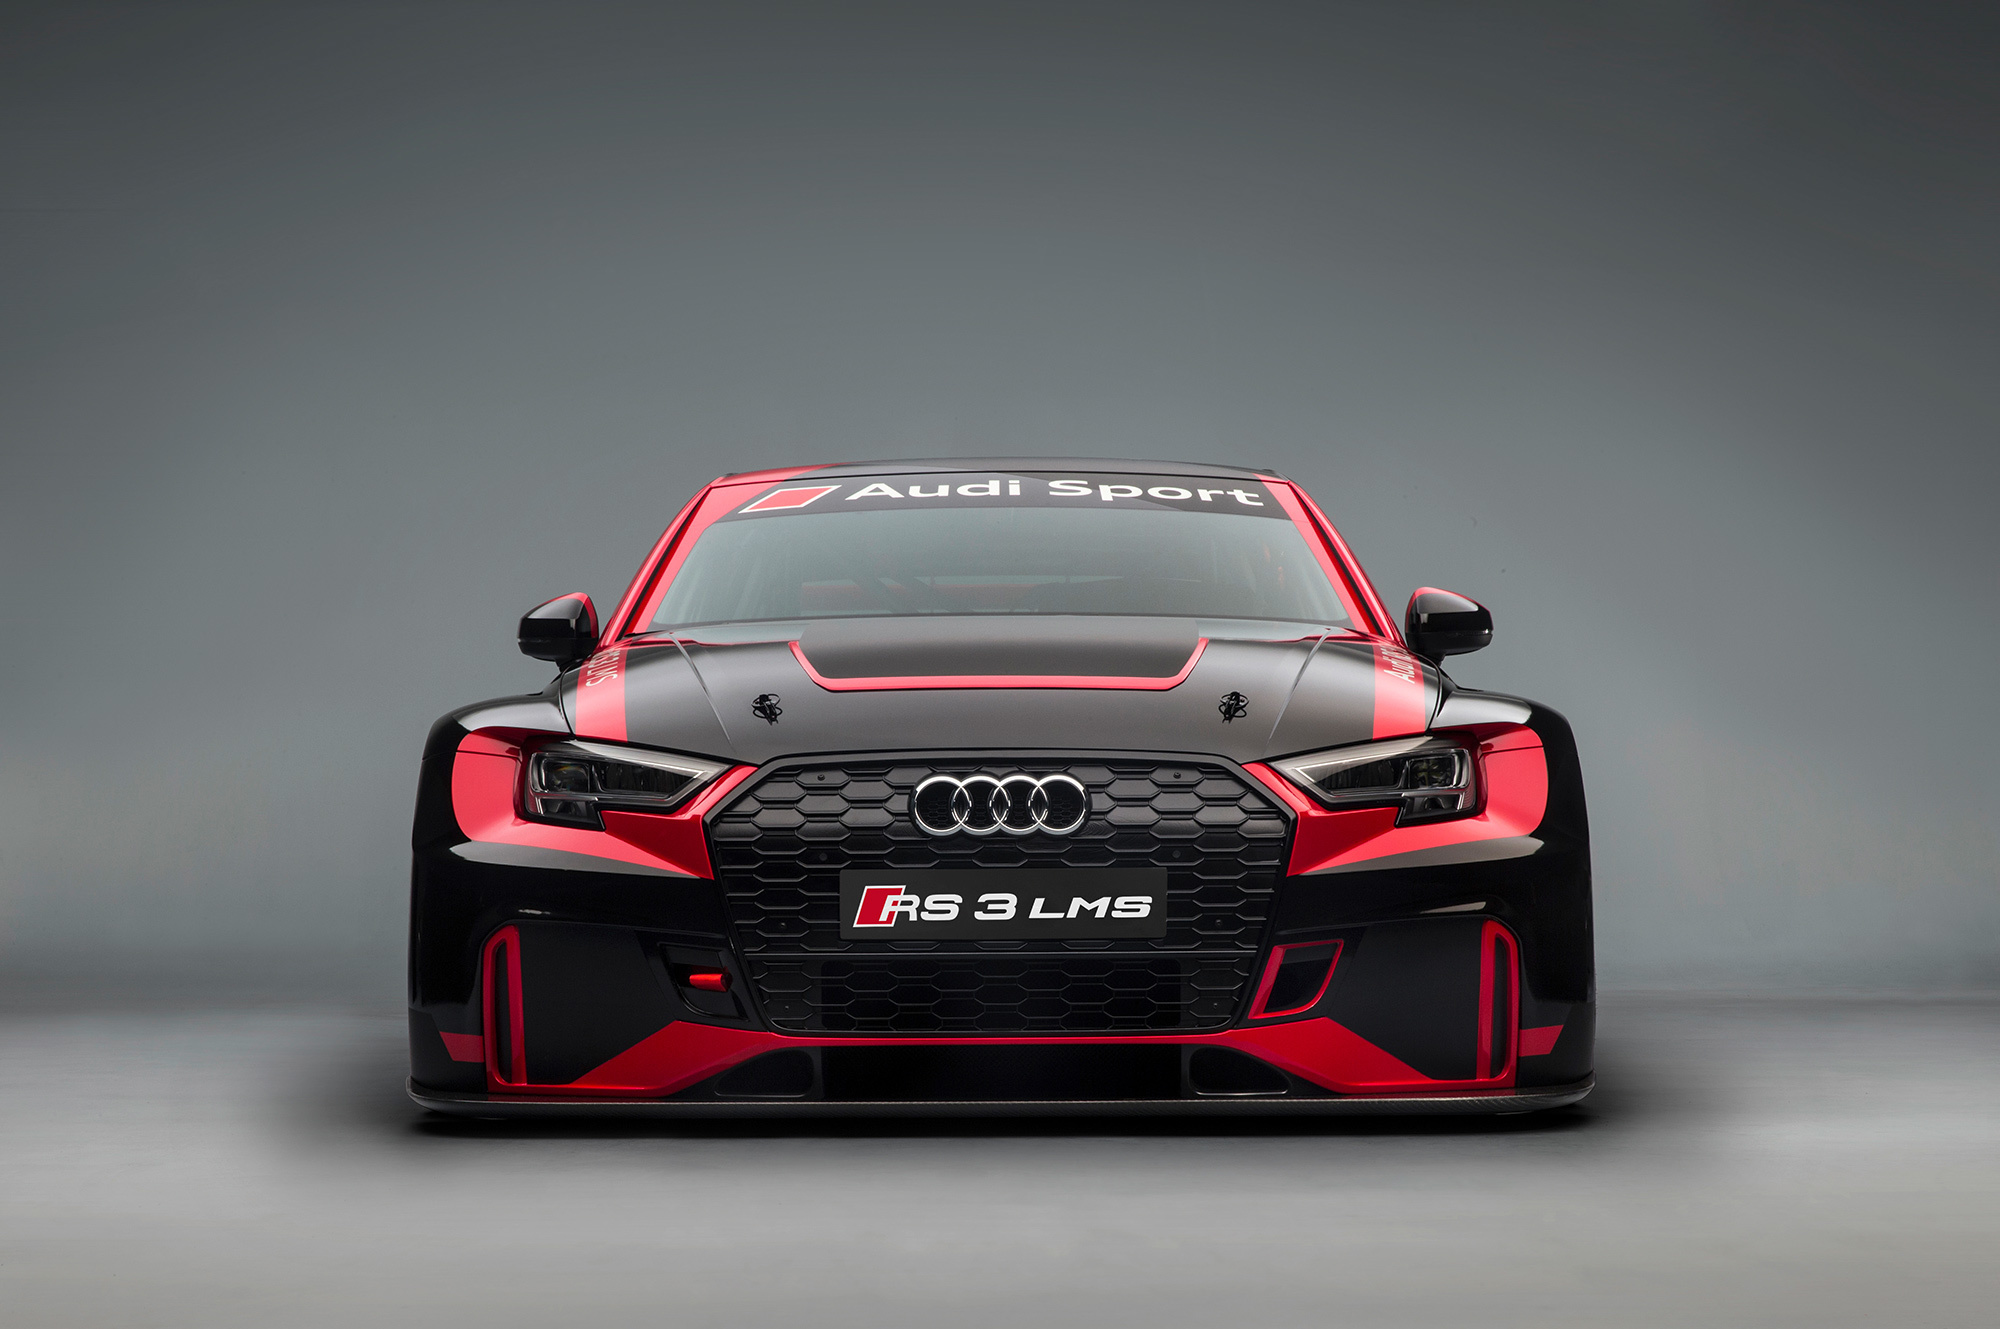 Audi RS 3 Deskto